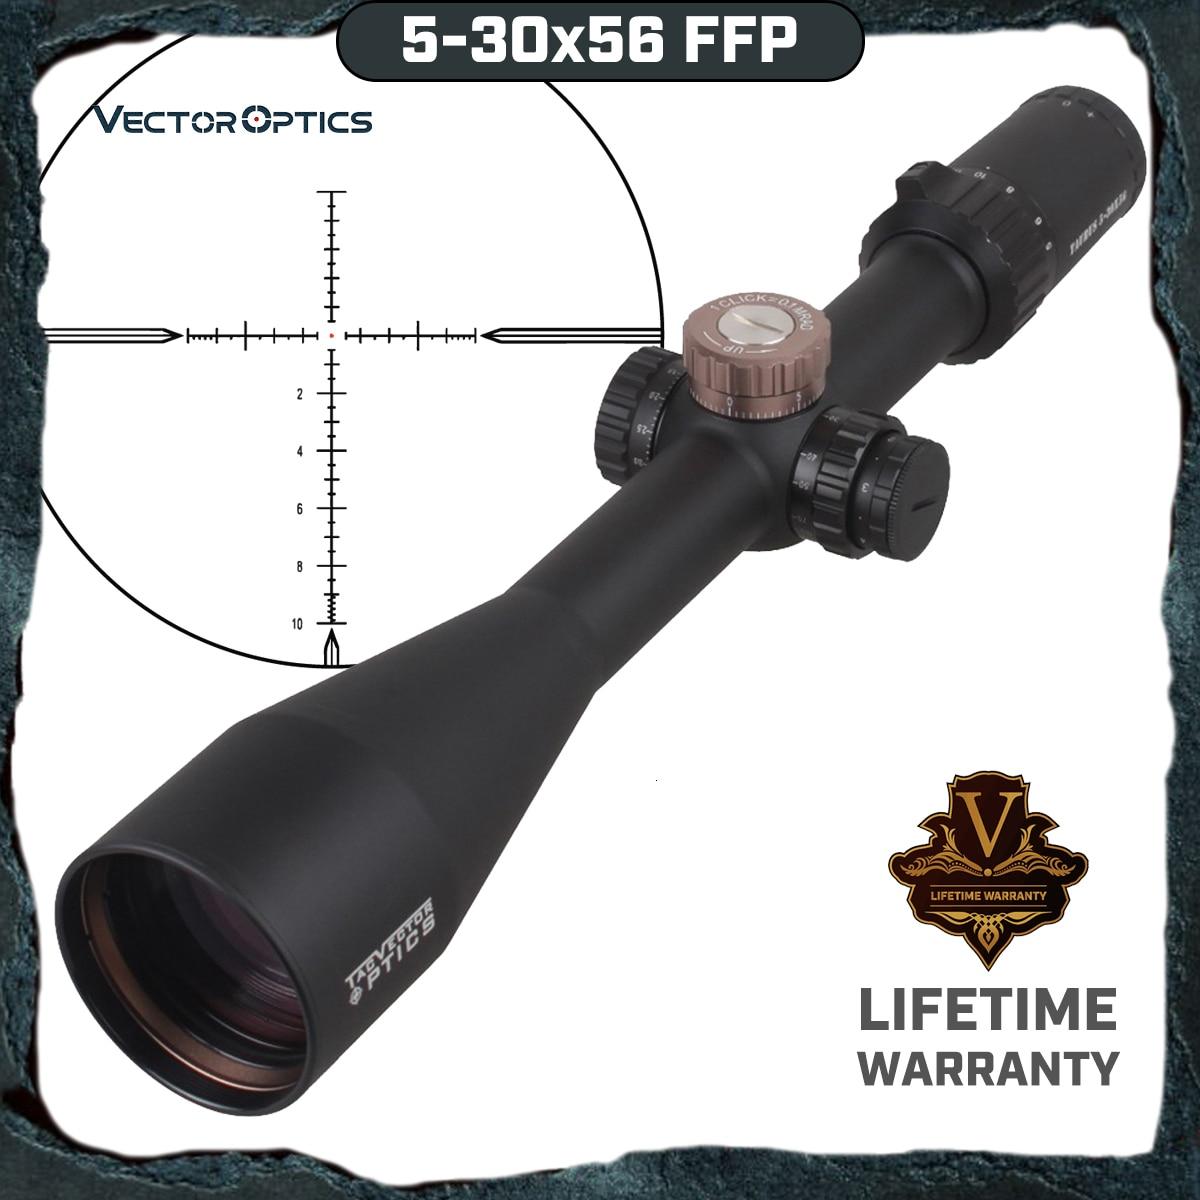 Vector Optics Taurus 5-30x56 First Focal Plane Military Tactical Riflescope Reticle High Quality Long Range Hunting Scope